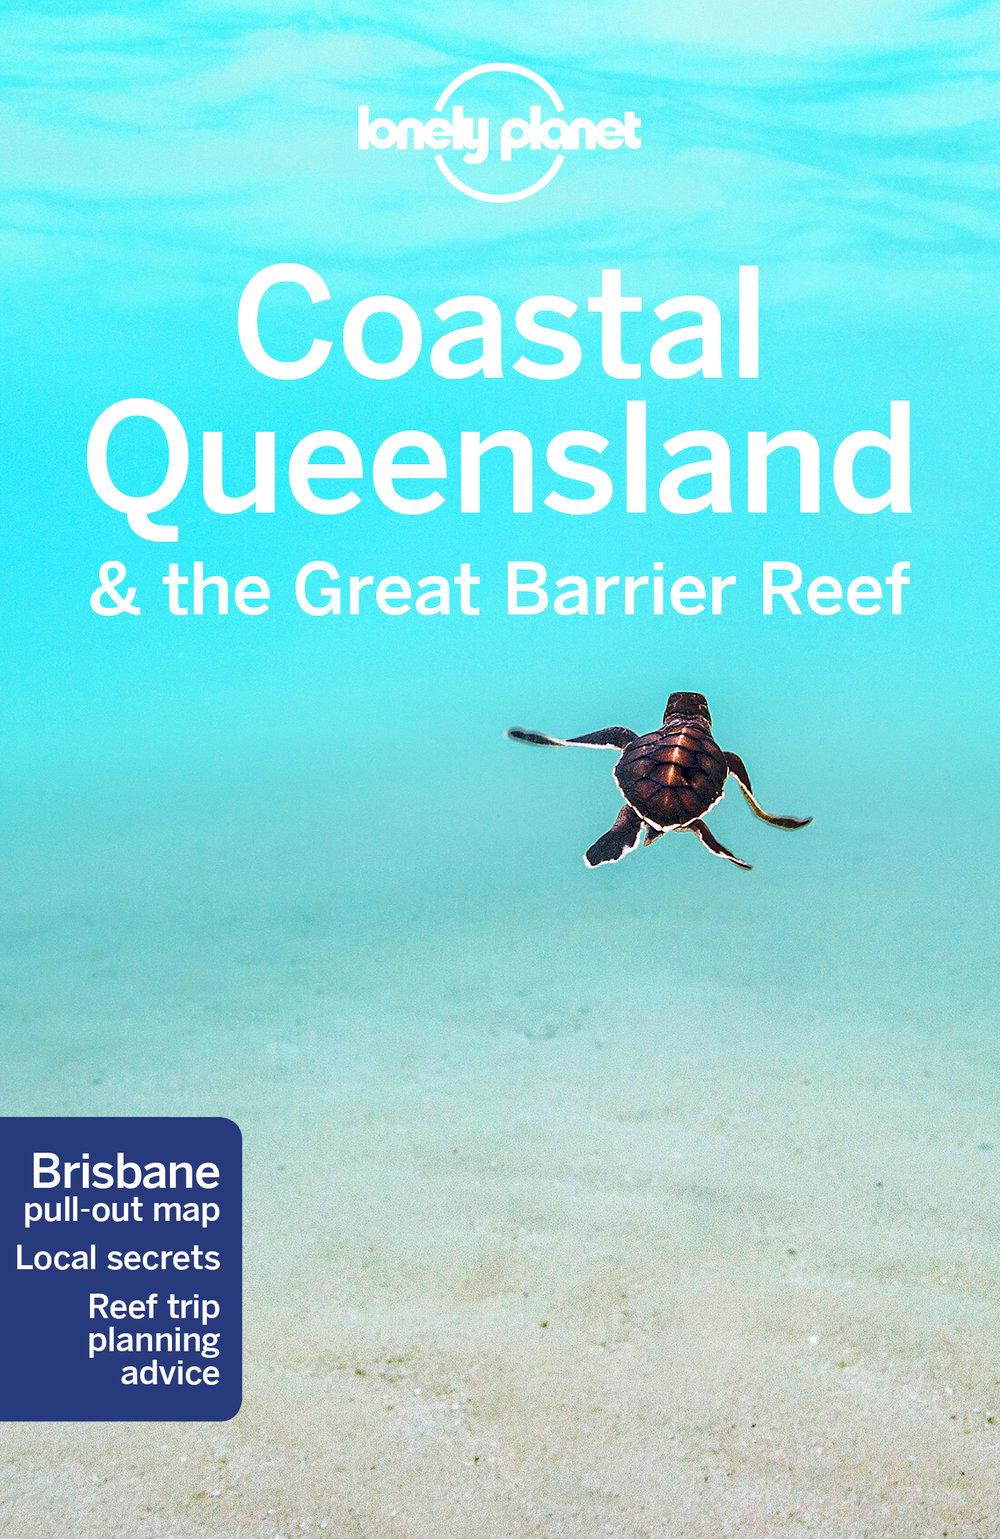 coastal qld and gbr.jpg